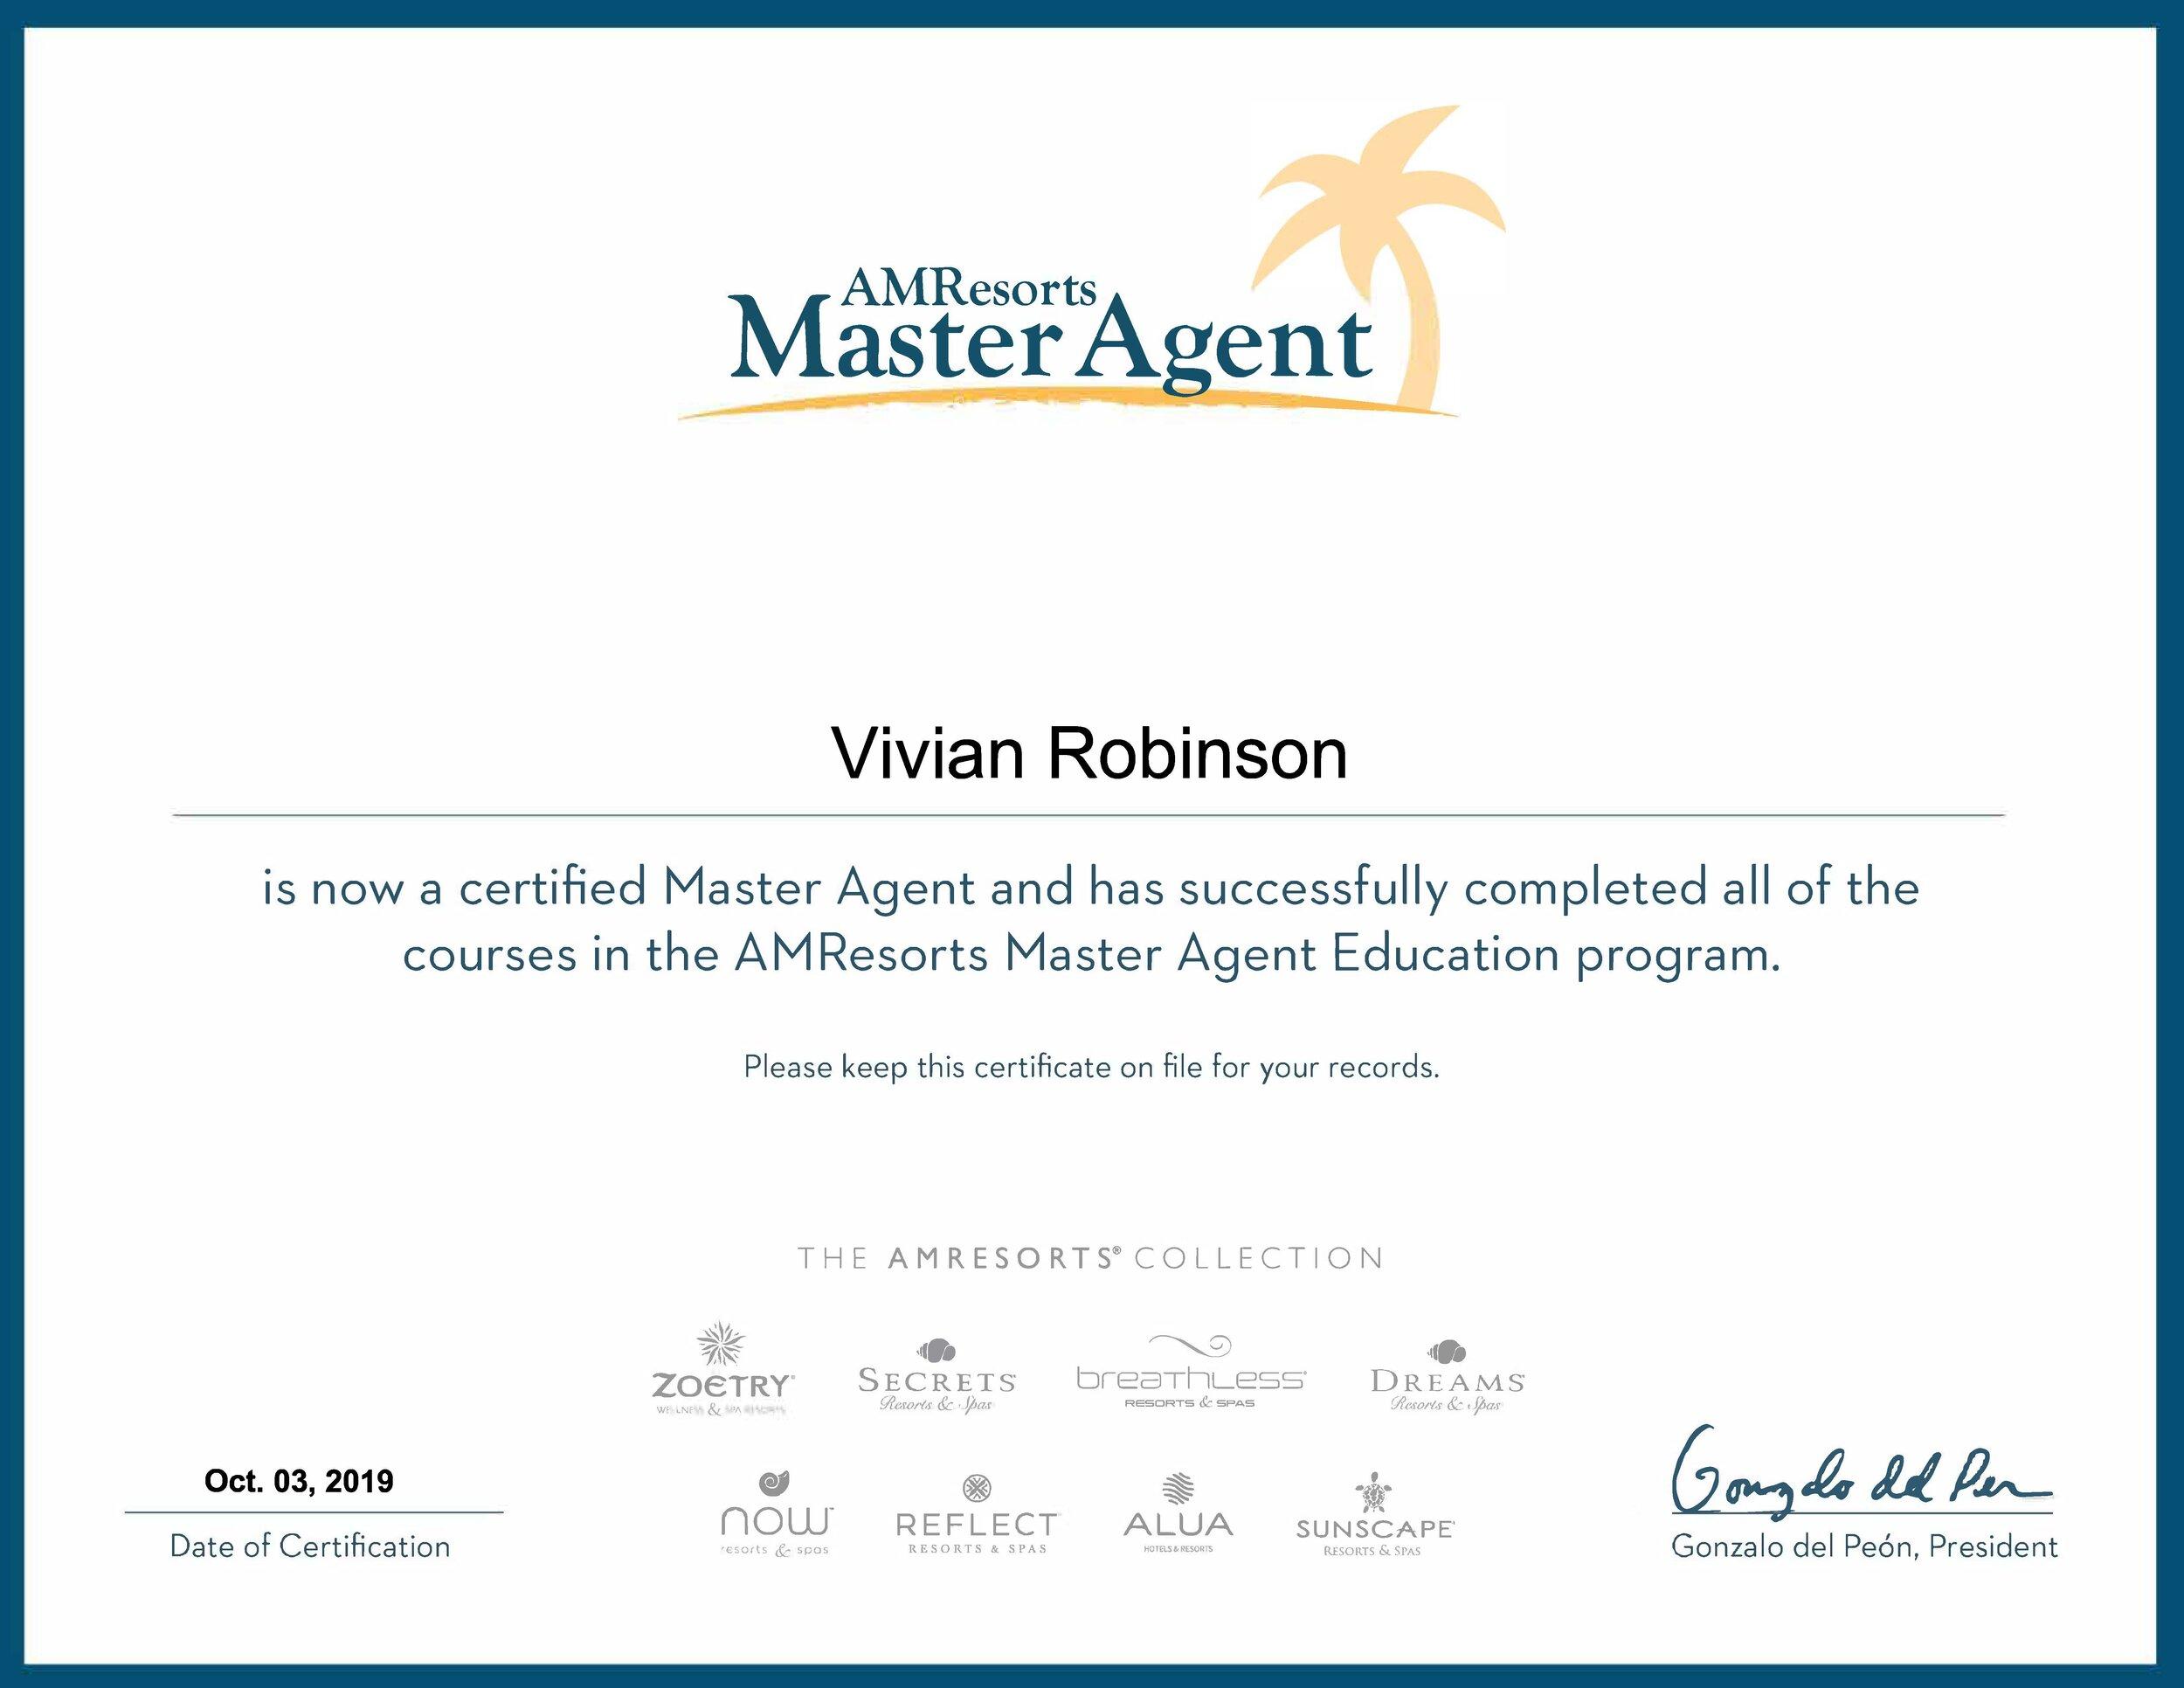 AM-Resorts-Master-Agent-Certificate.jpg